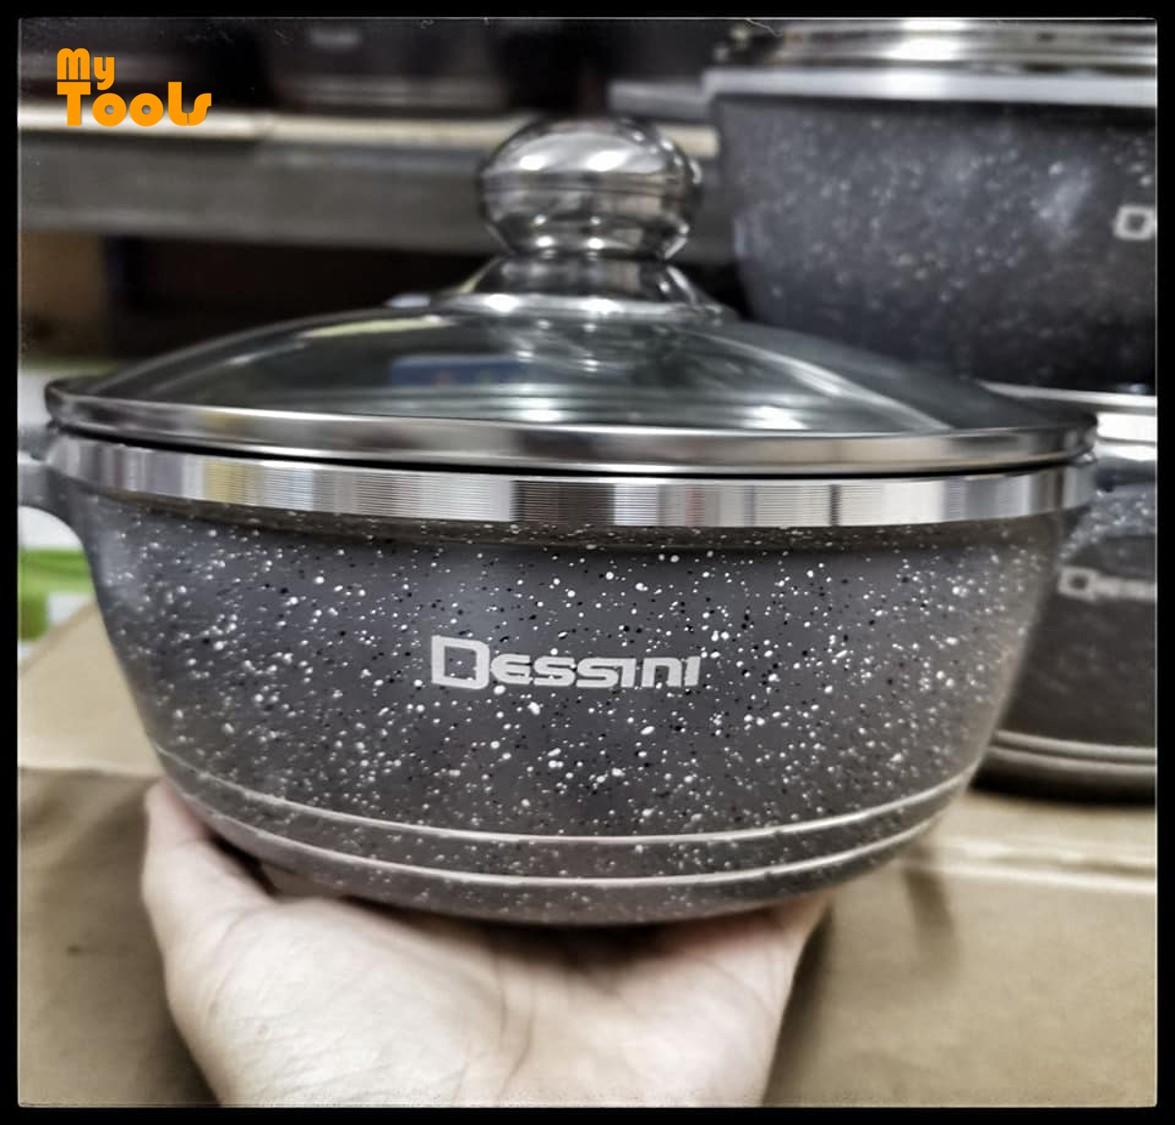 Mytools 10pcs Dessini Italy Cooking Set High Class Non Stick Ceramic Cookware Pot (Full Glass Lid)